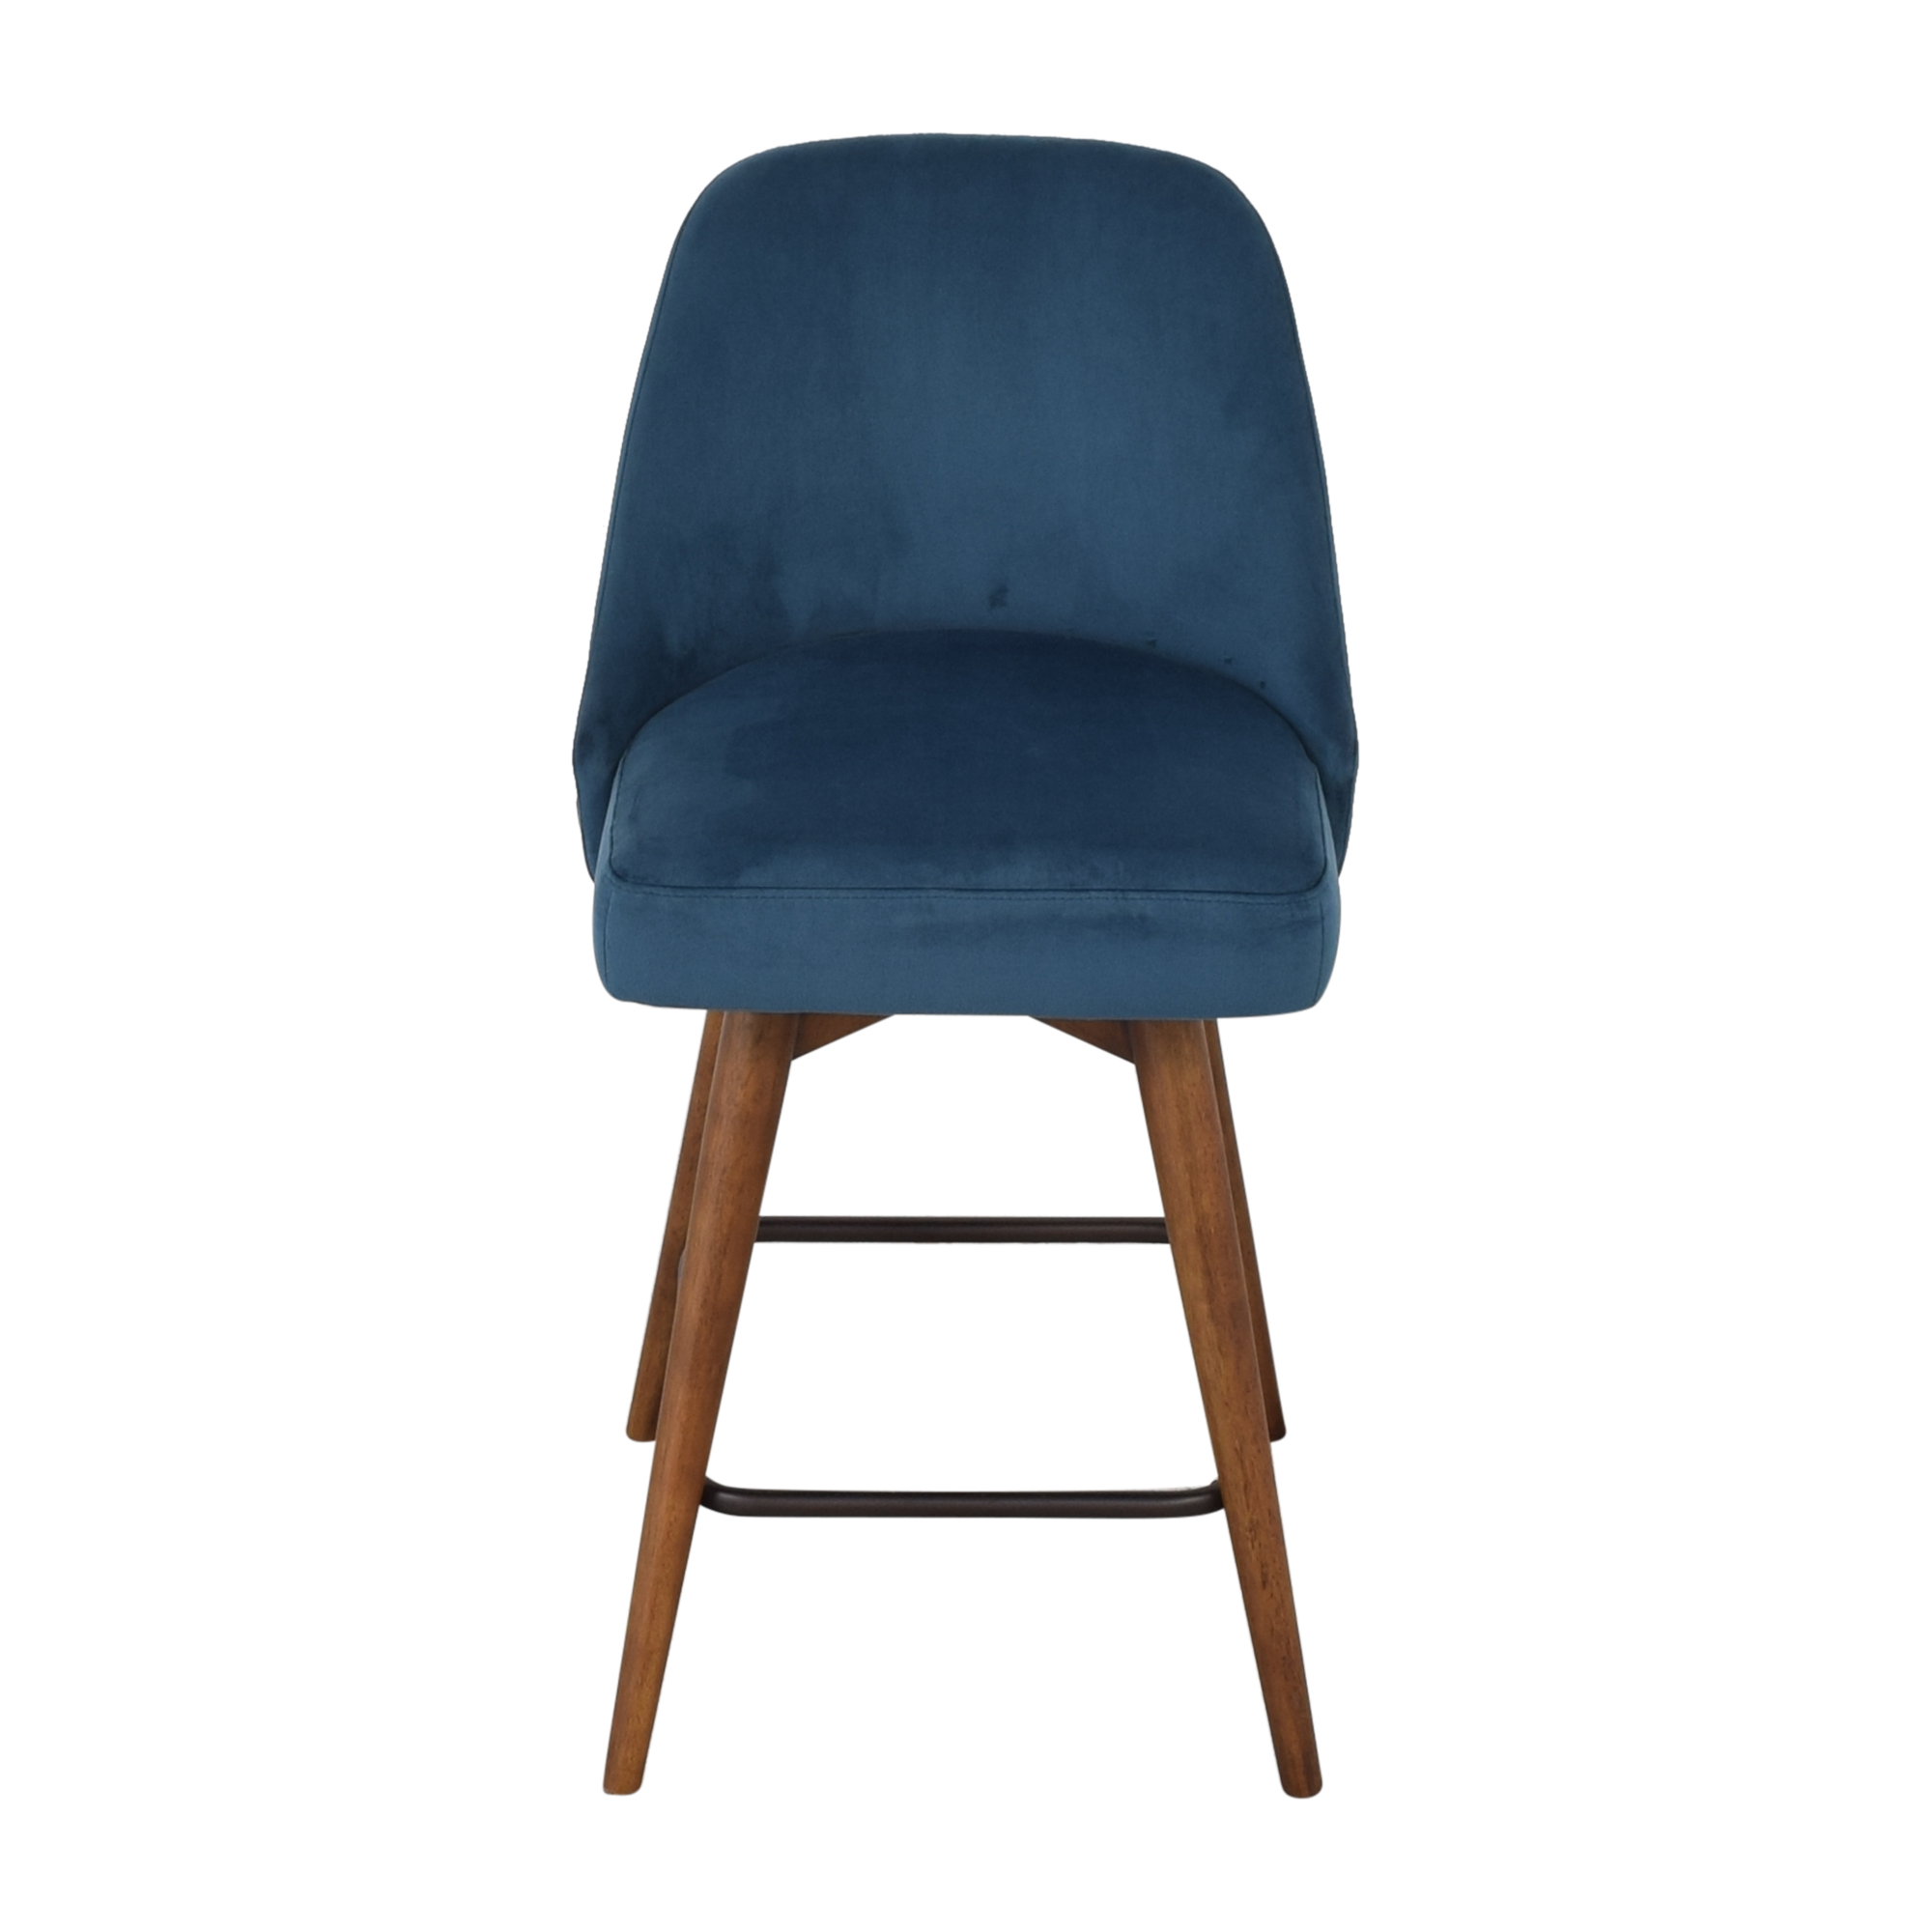 West Elm West Elm Mid-Century Upholstered Swivel Counter Stool blue